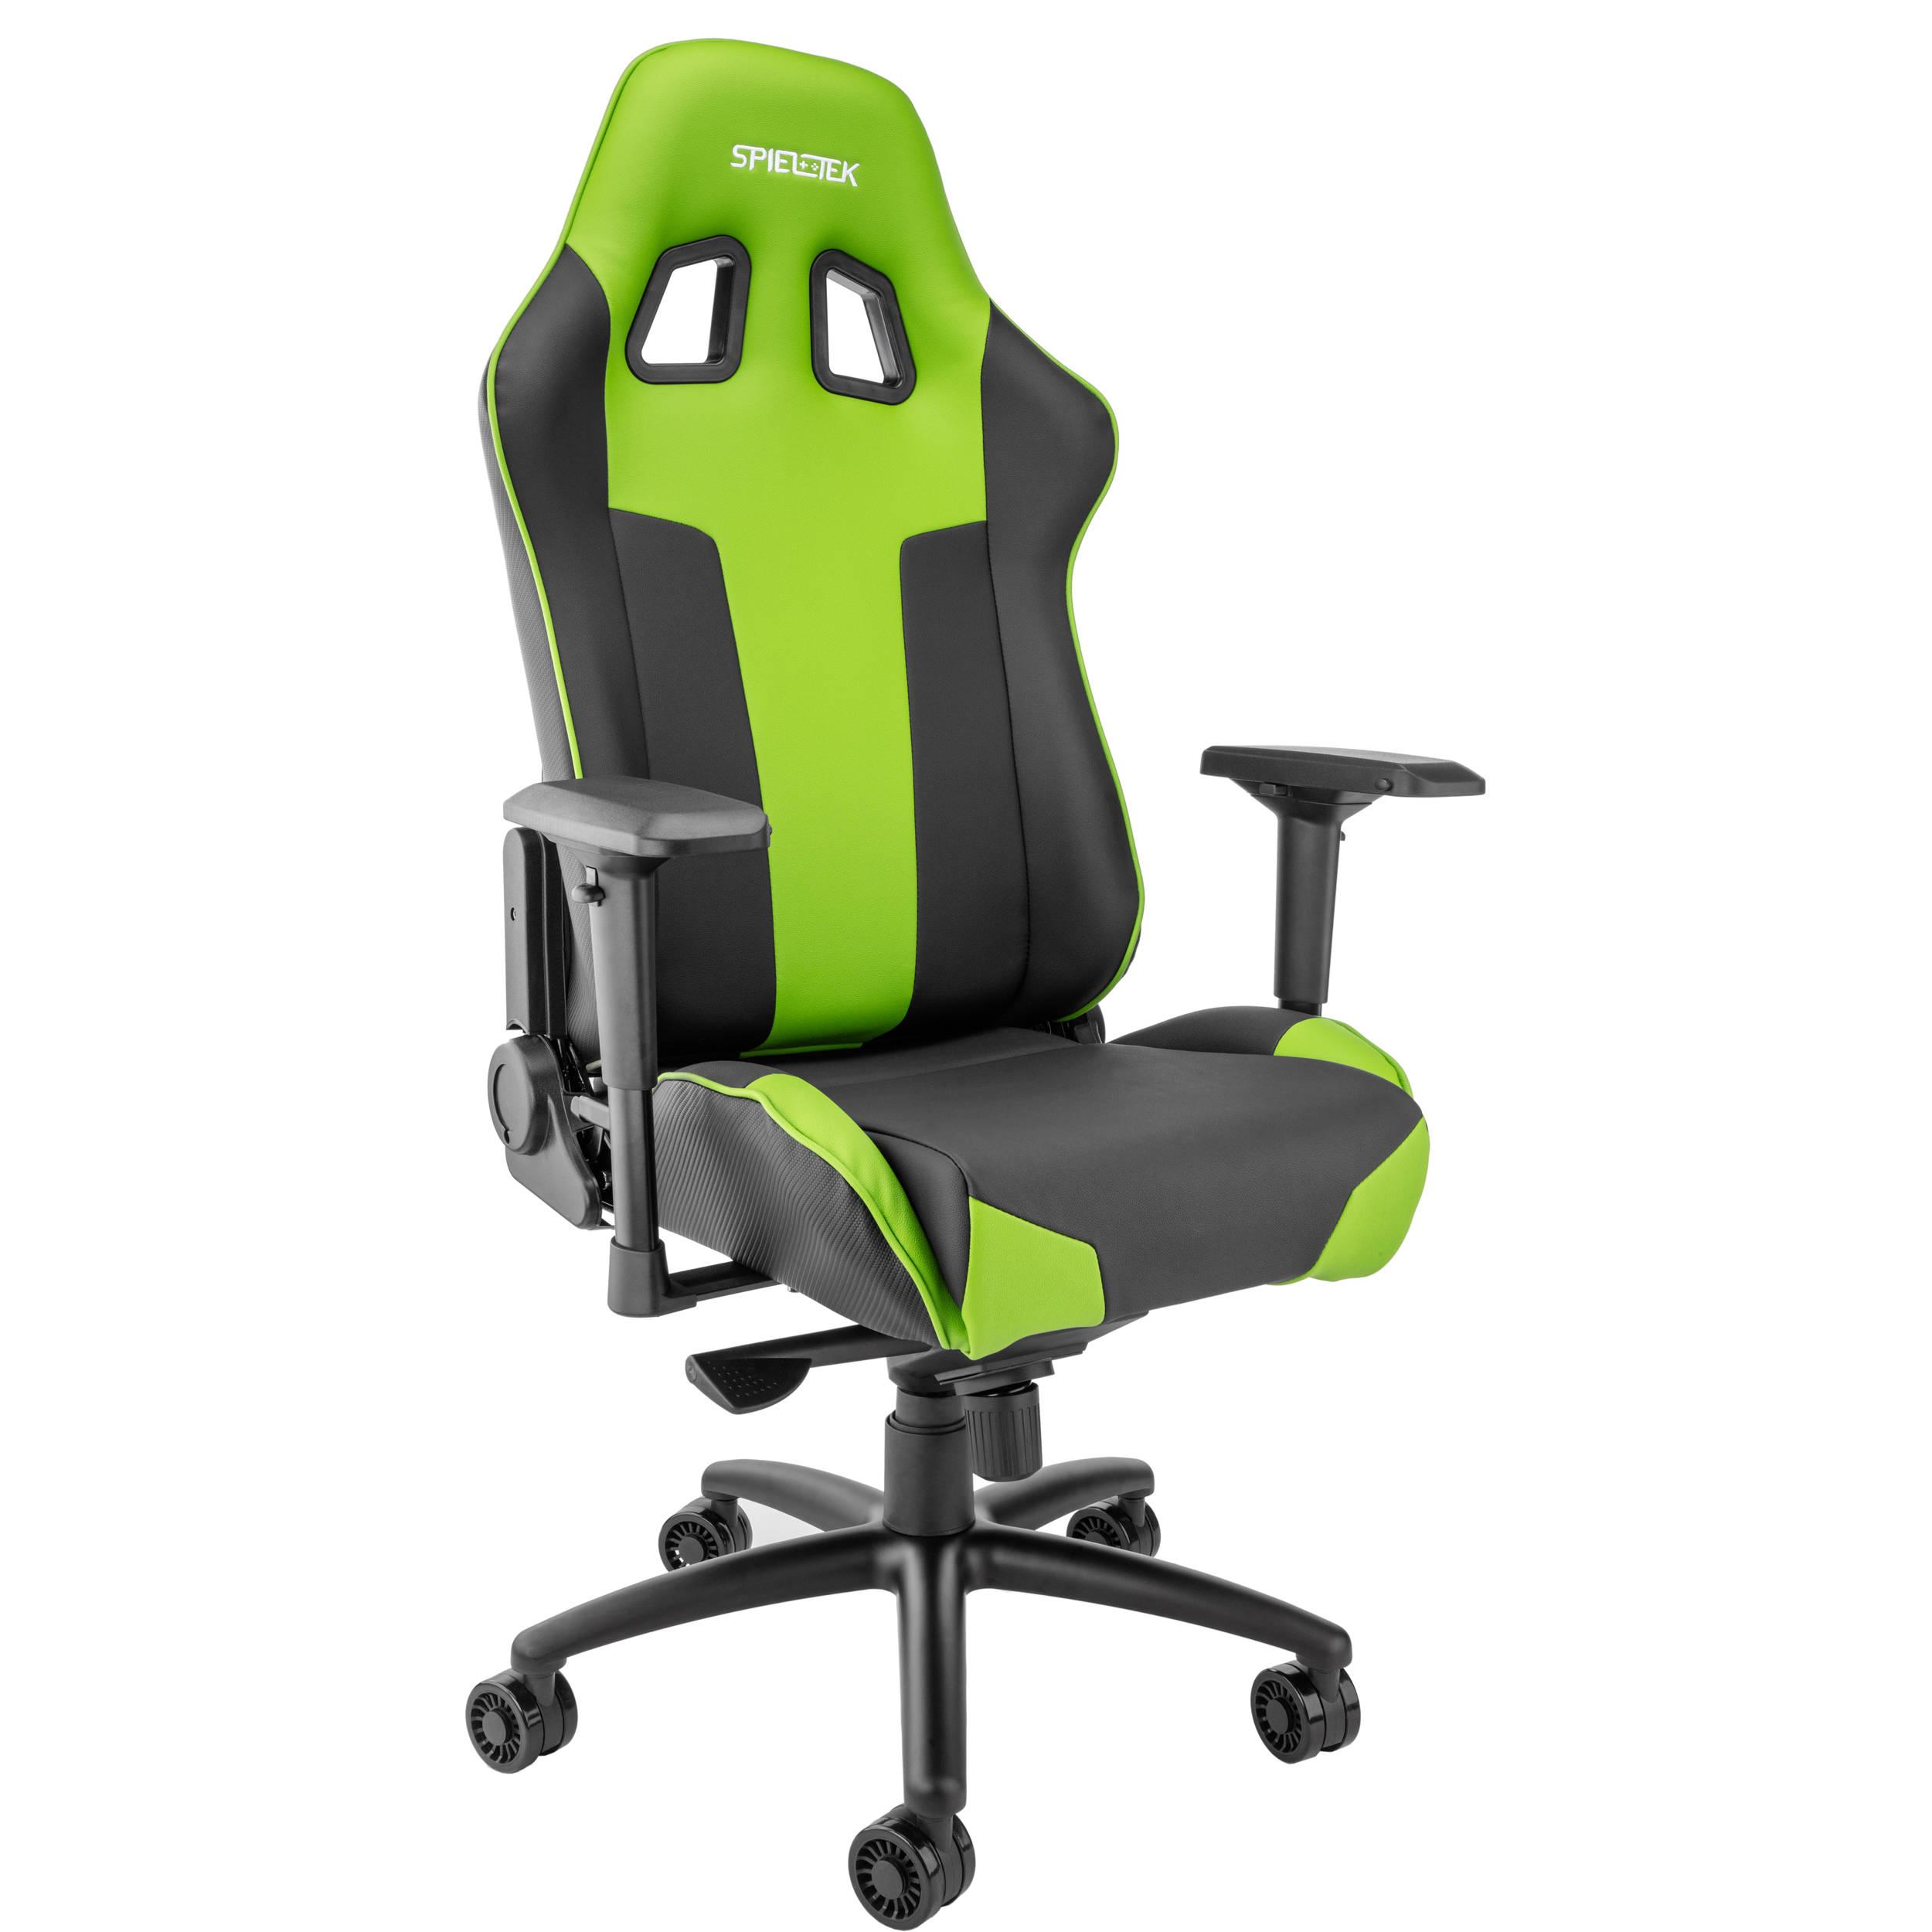 Spieltek Bandit XL Gaming Chair Green GC 211 BG B&H